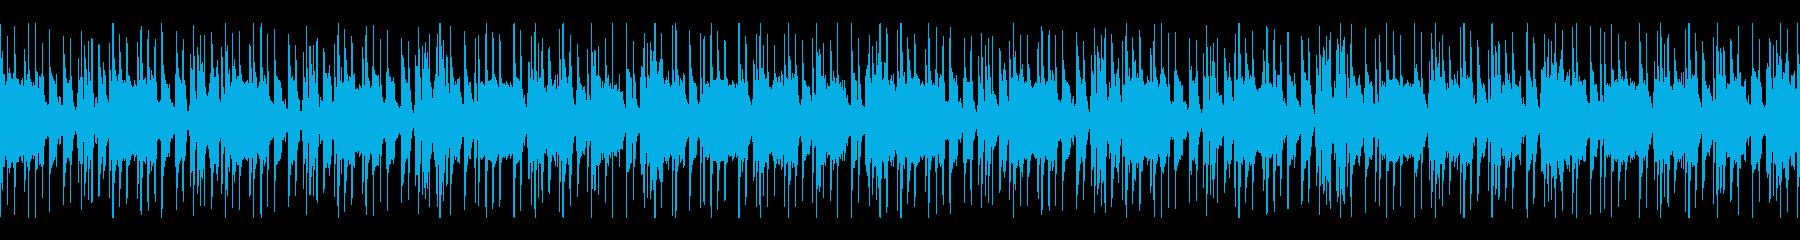 Rockな雰囲気の導入曲です。の再生済みの波形